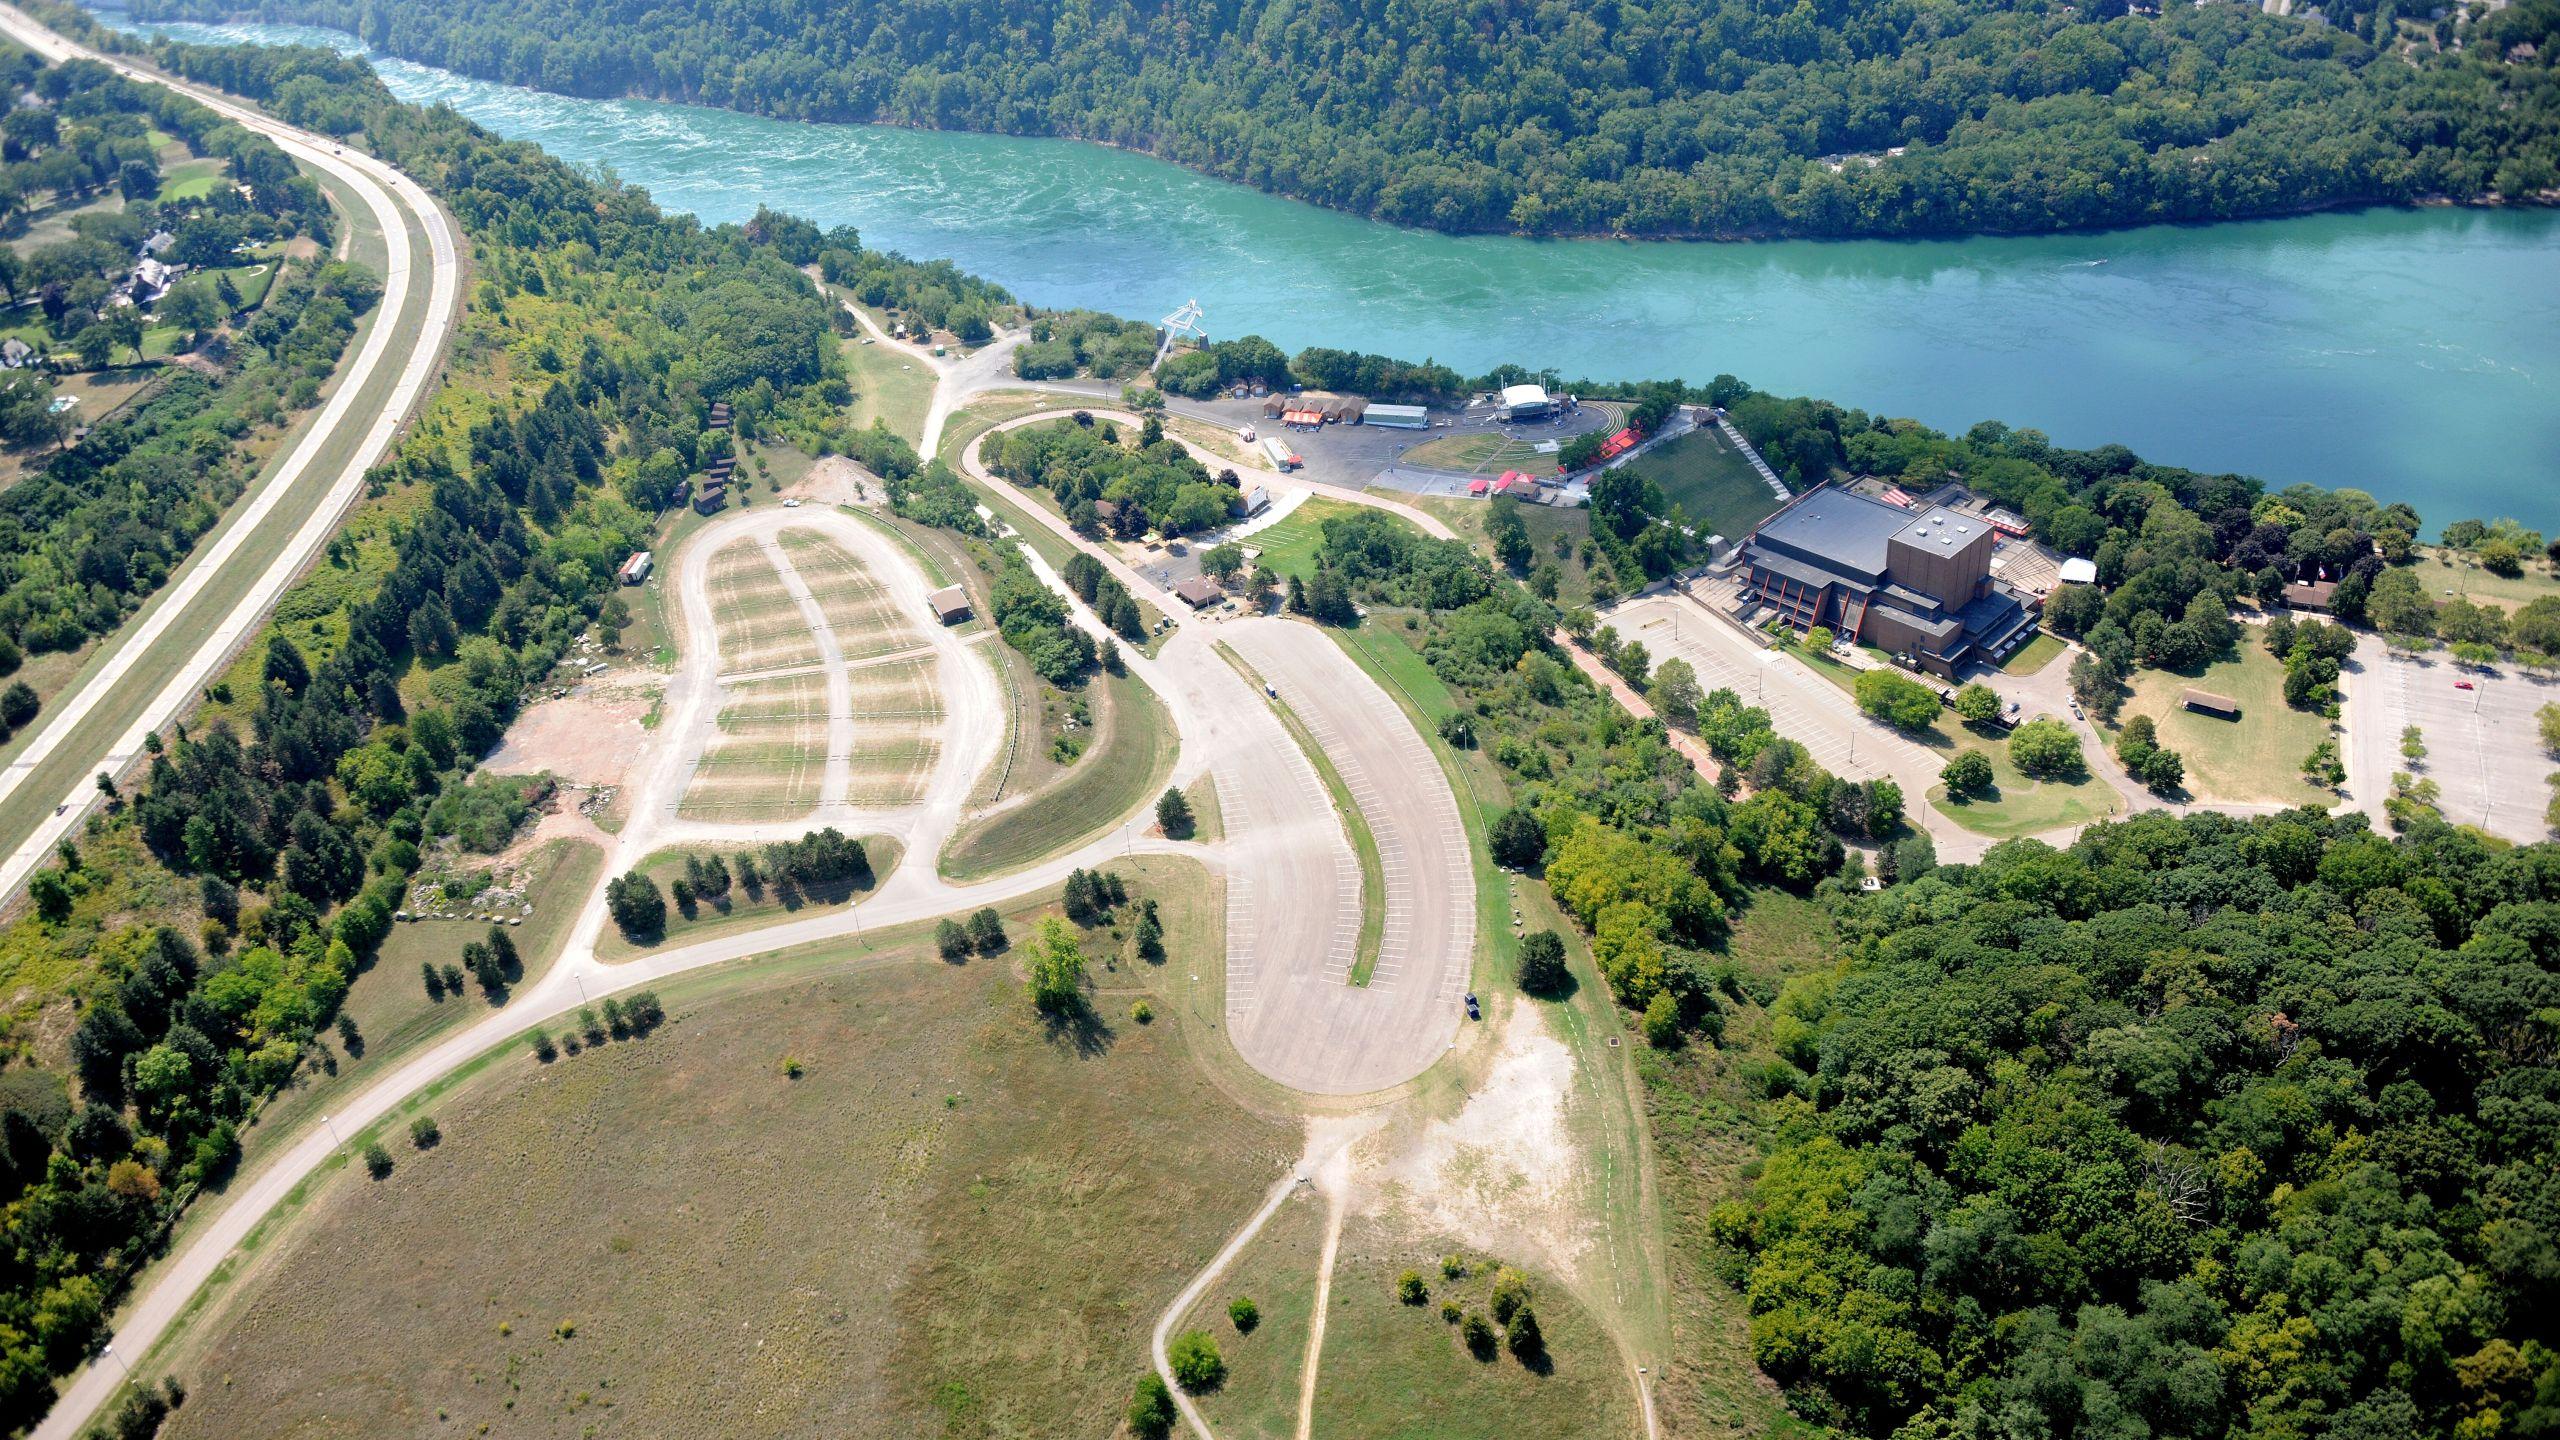 Artpark Aerial_1554428156146.jpeg.jpg